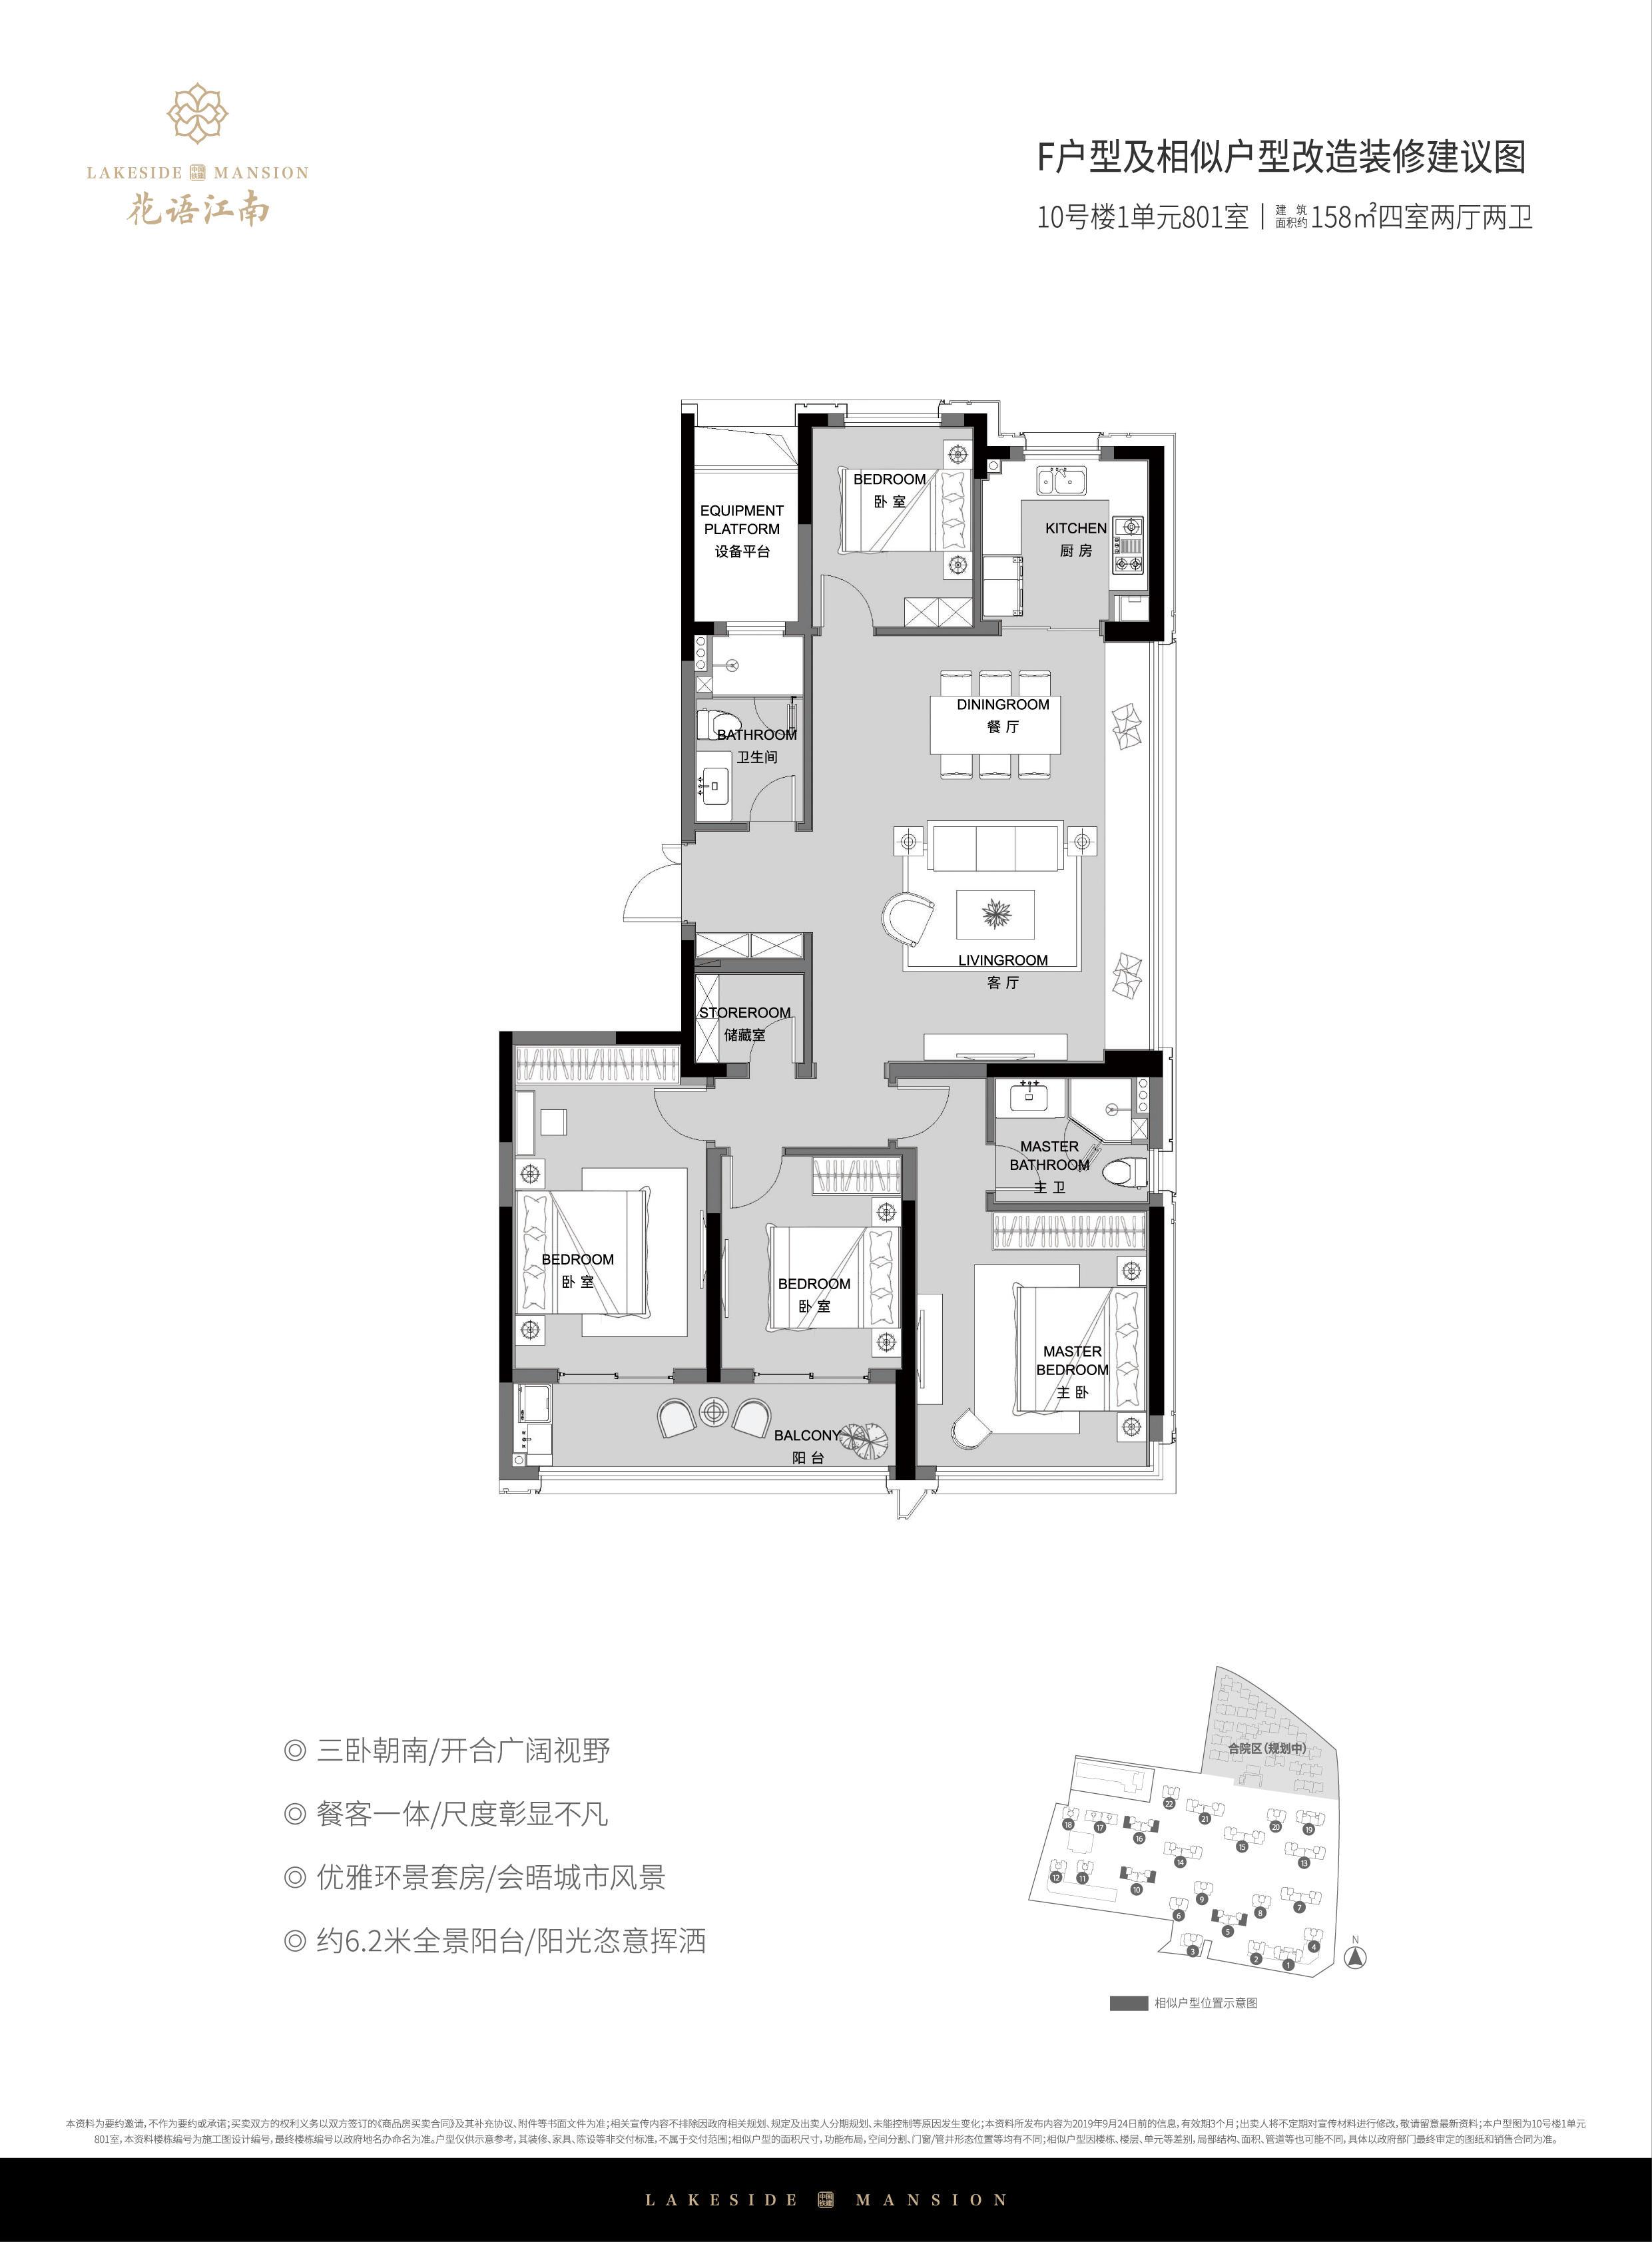 F户型 3室2厅2卫 158㎡